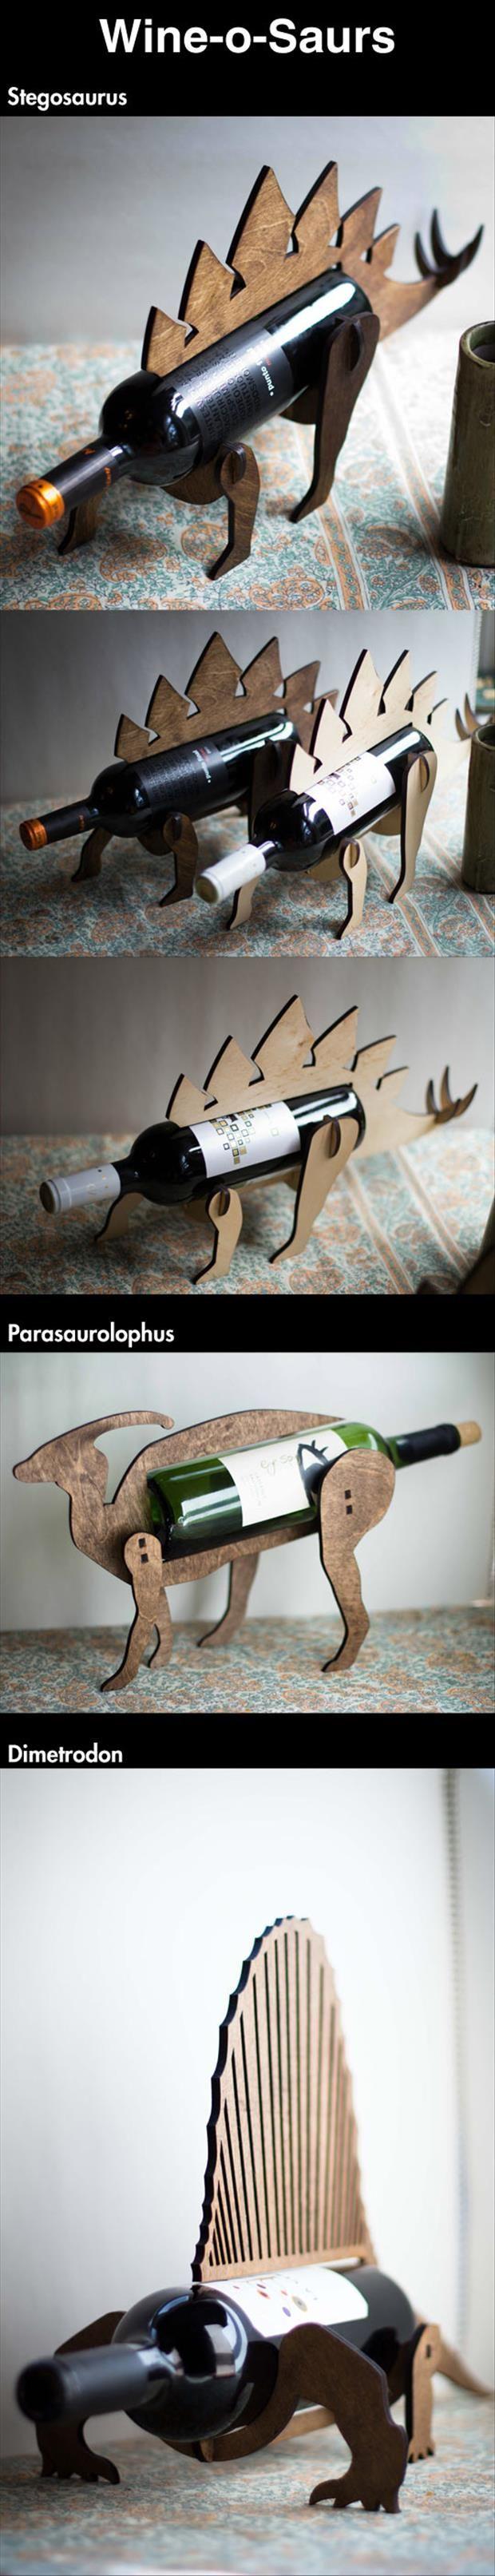 Dinosaur wine racks wine o saurus - Dinosaur wine holder ...